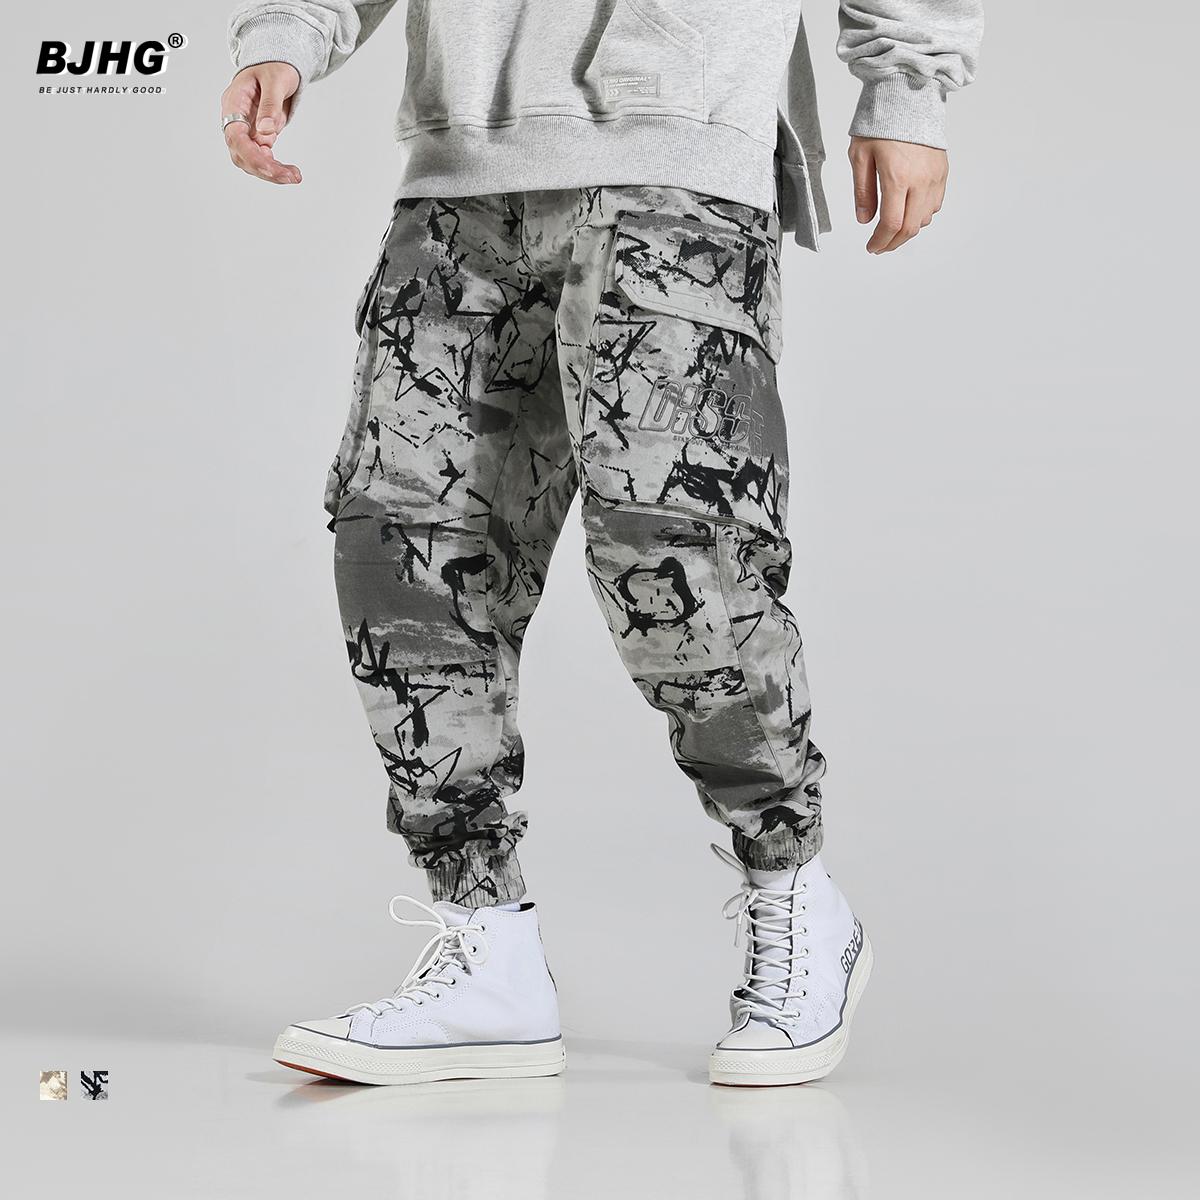 bjhg秋迷彩工装男国潮字母刺绣裤子(非品牌)